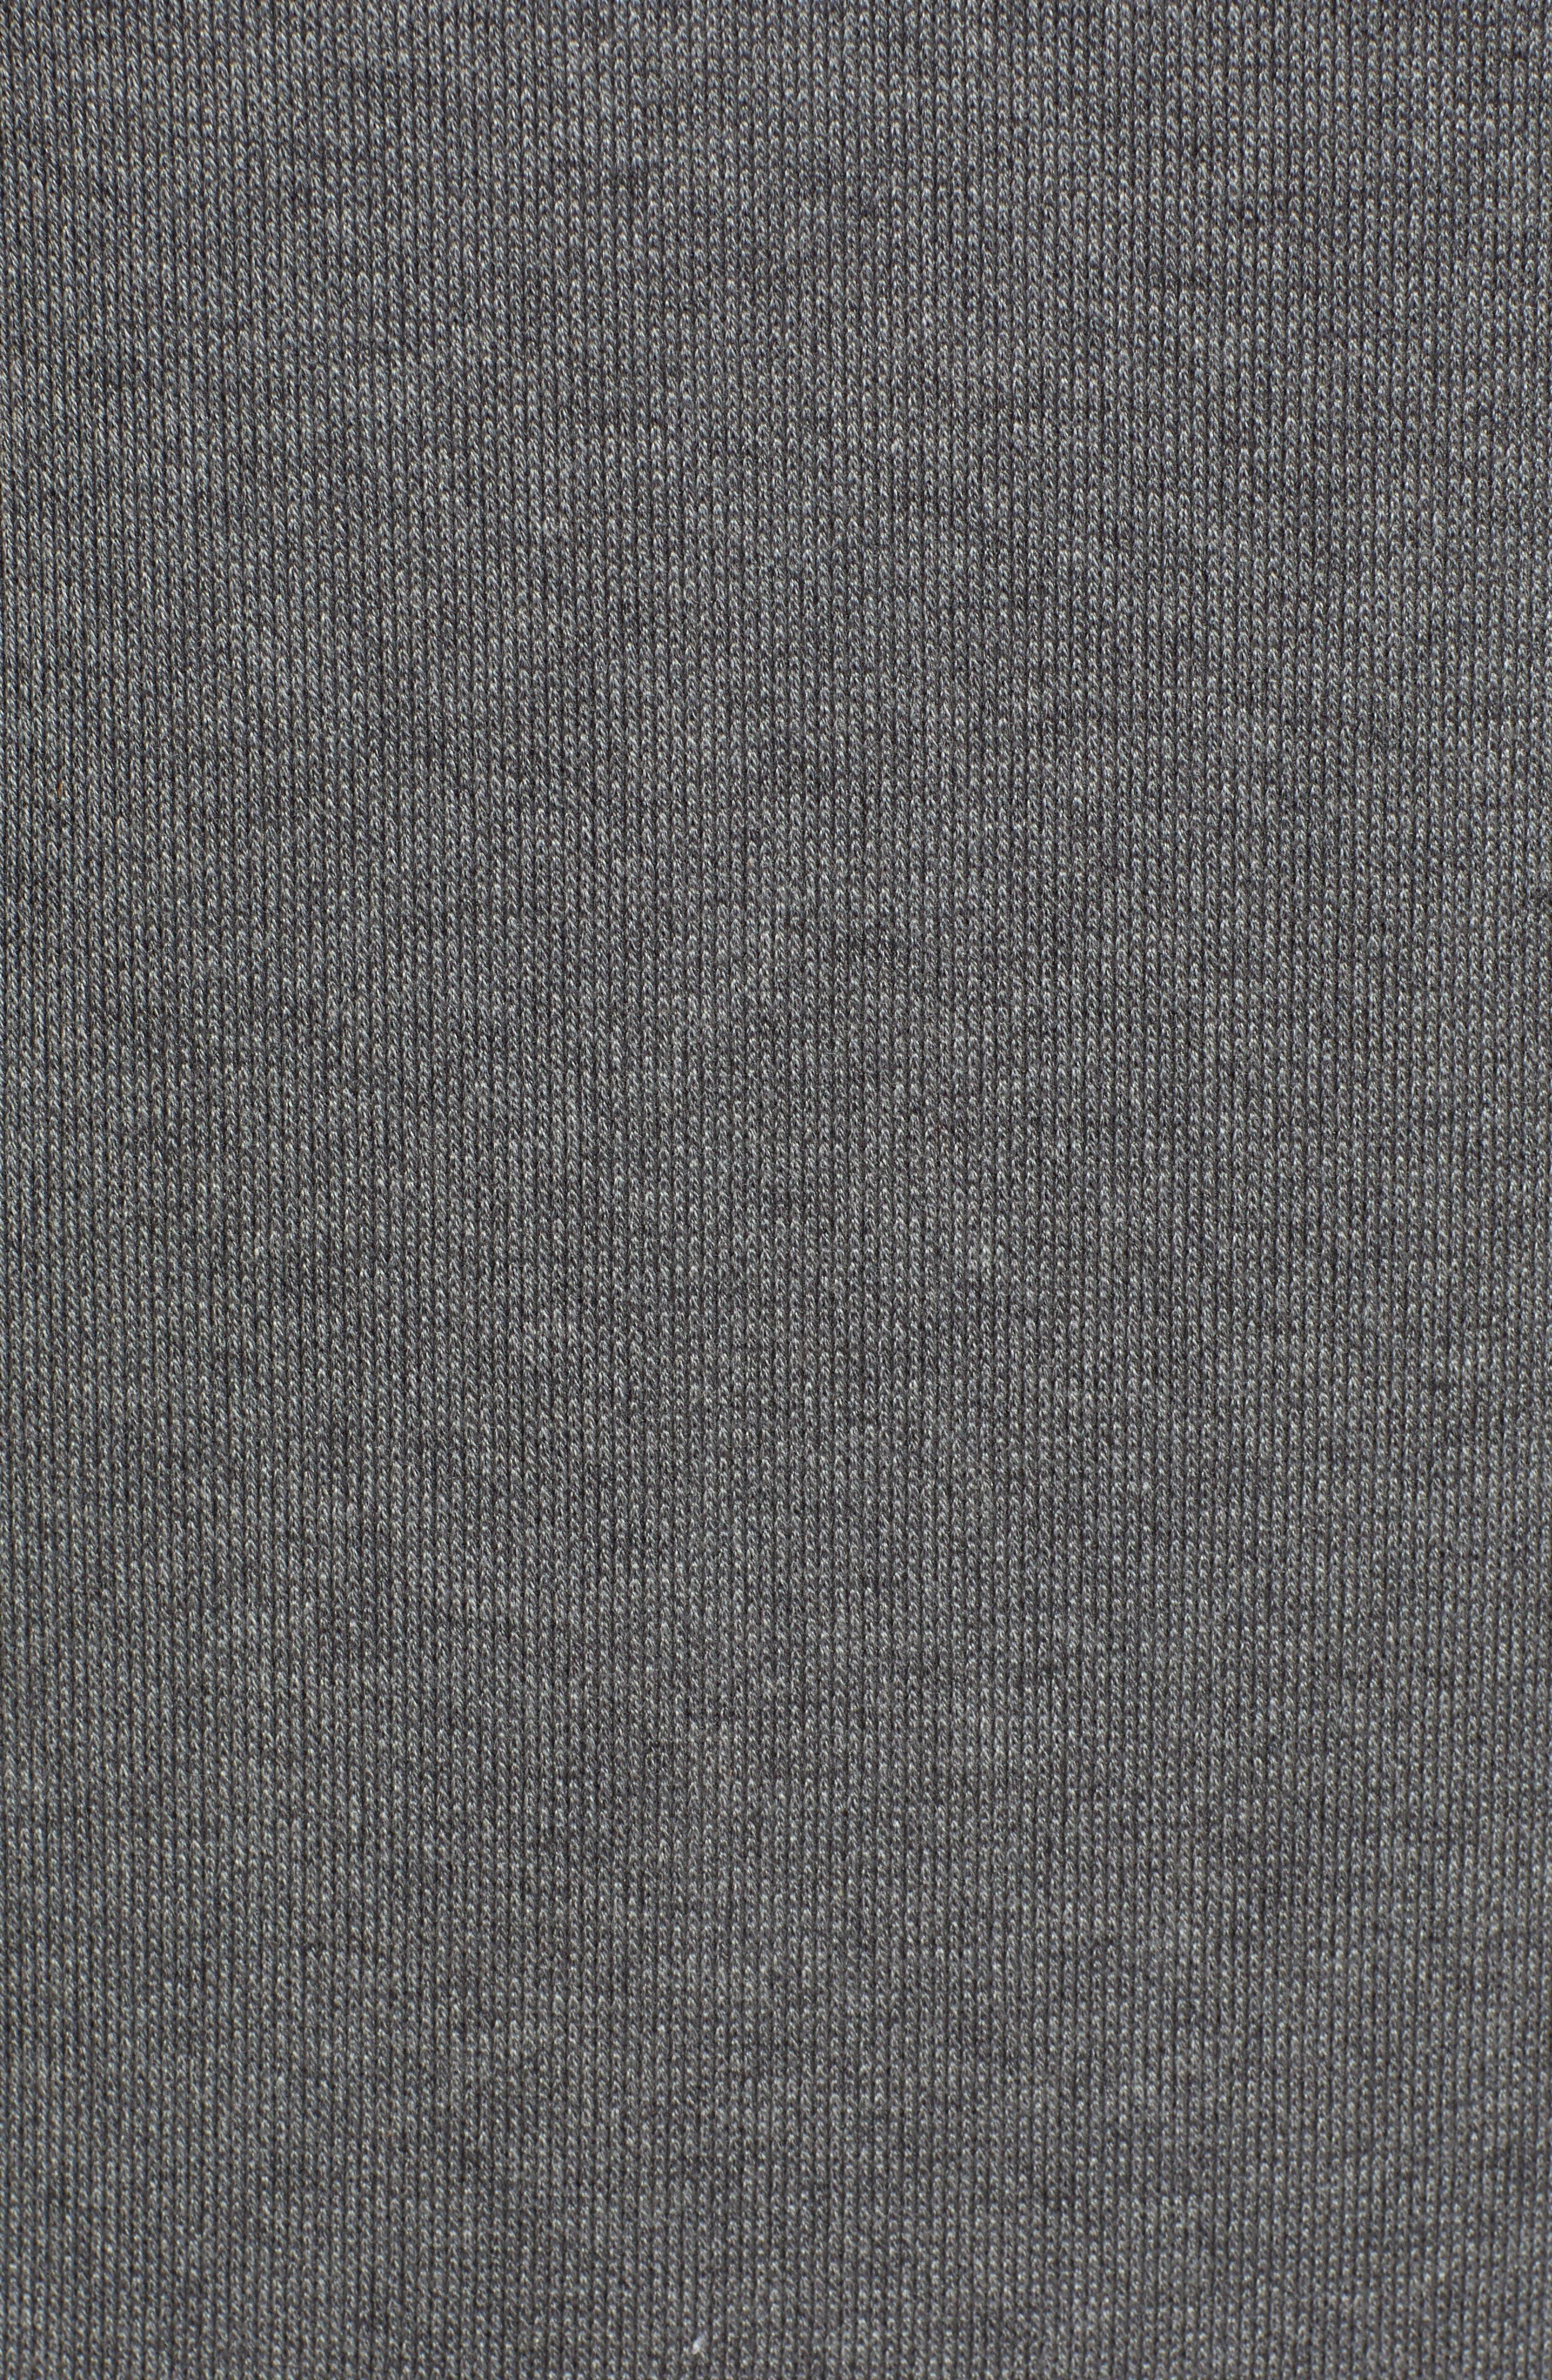 Debasti Cotton Zip Hoodie,                             Alternate thumbnail 5, color,                             081